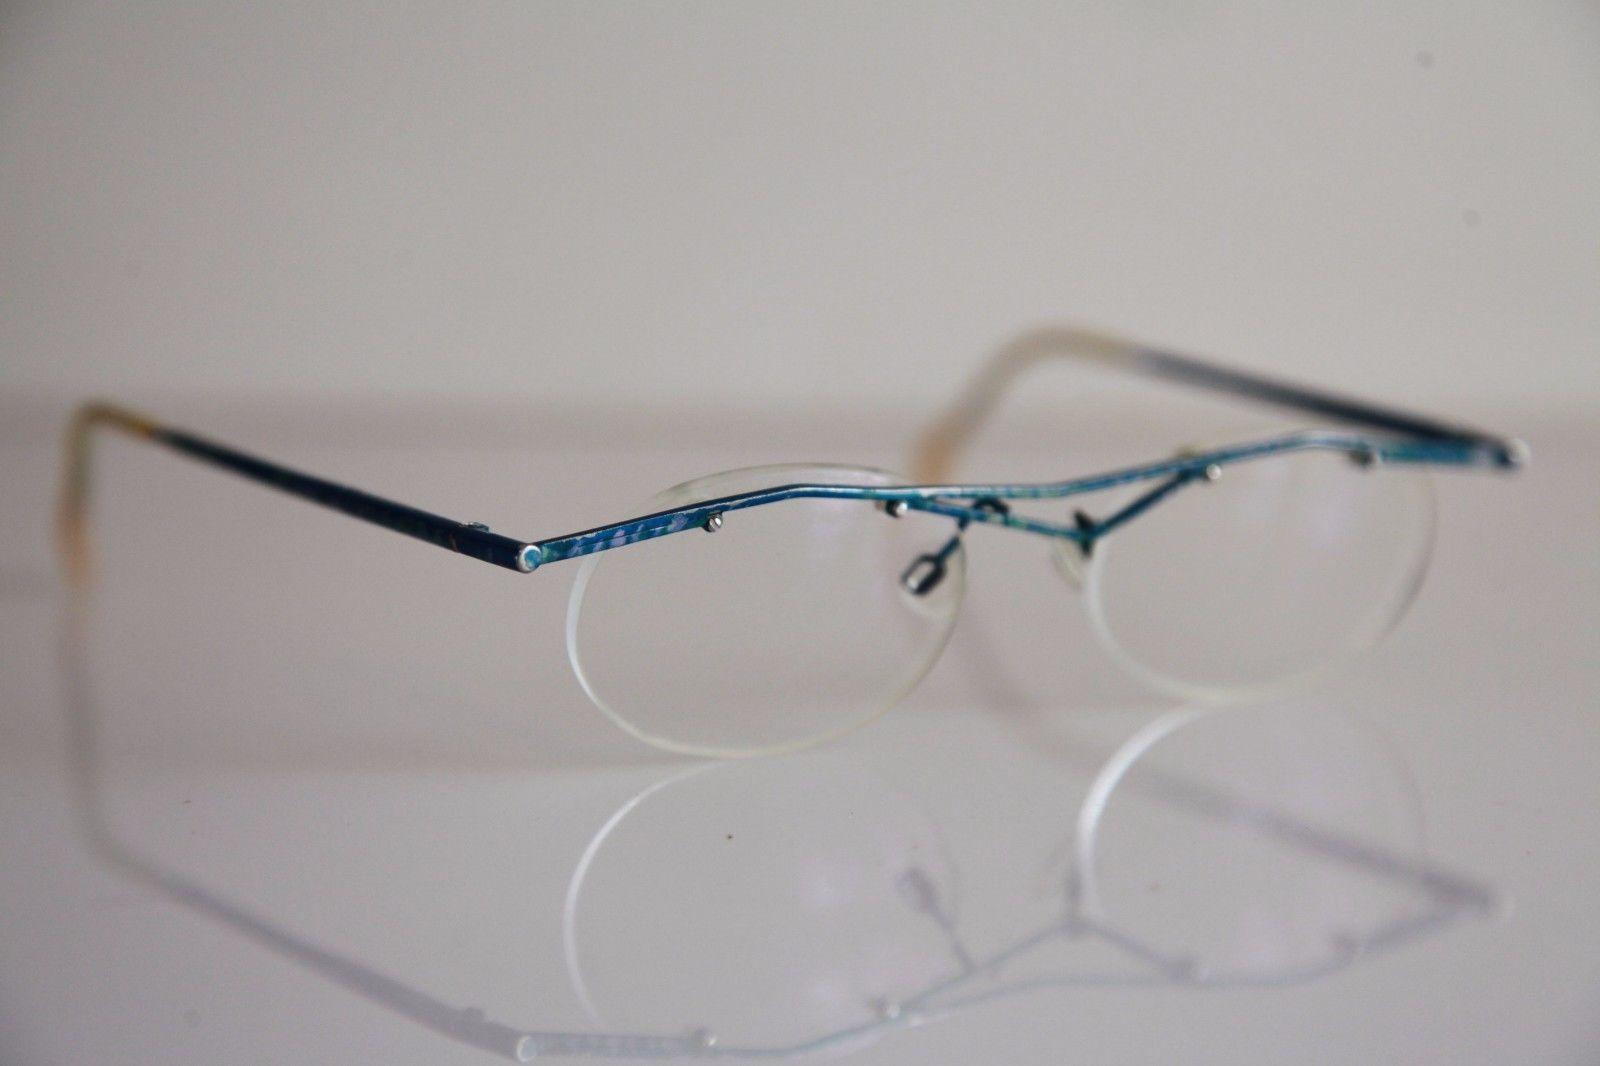 CFL Eyewear, Blue Half Rimless Frame, RX-Able Prescription Lenses. Germany